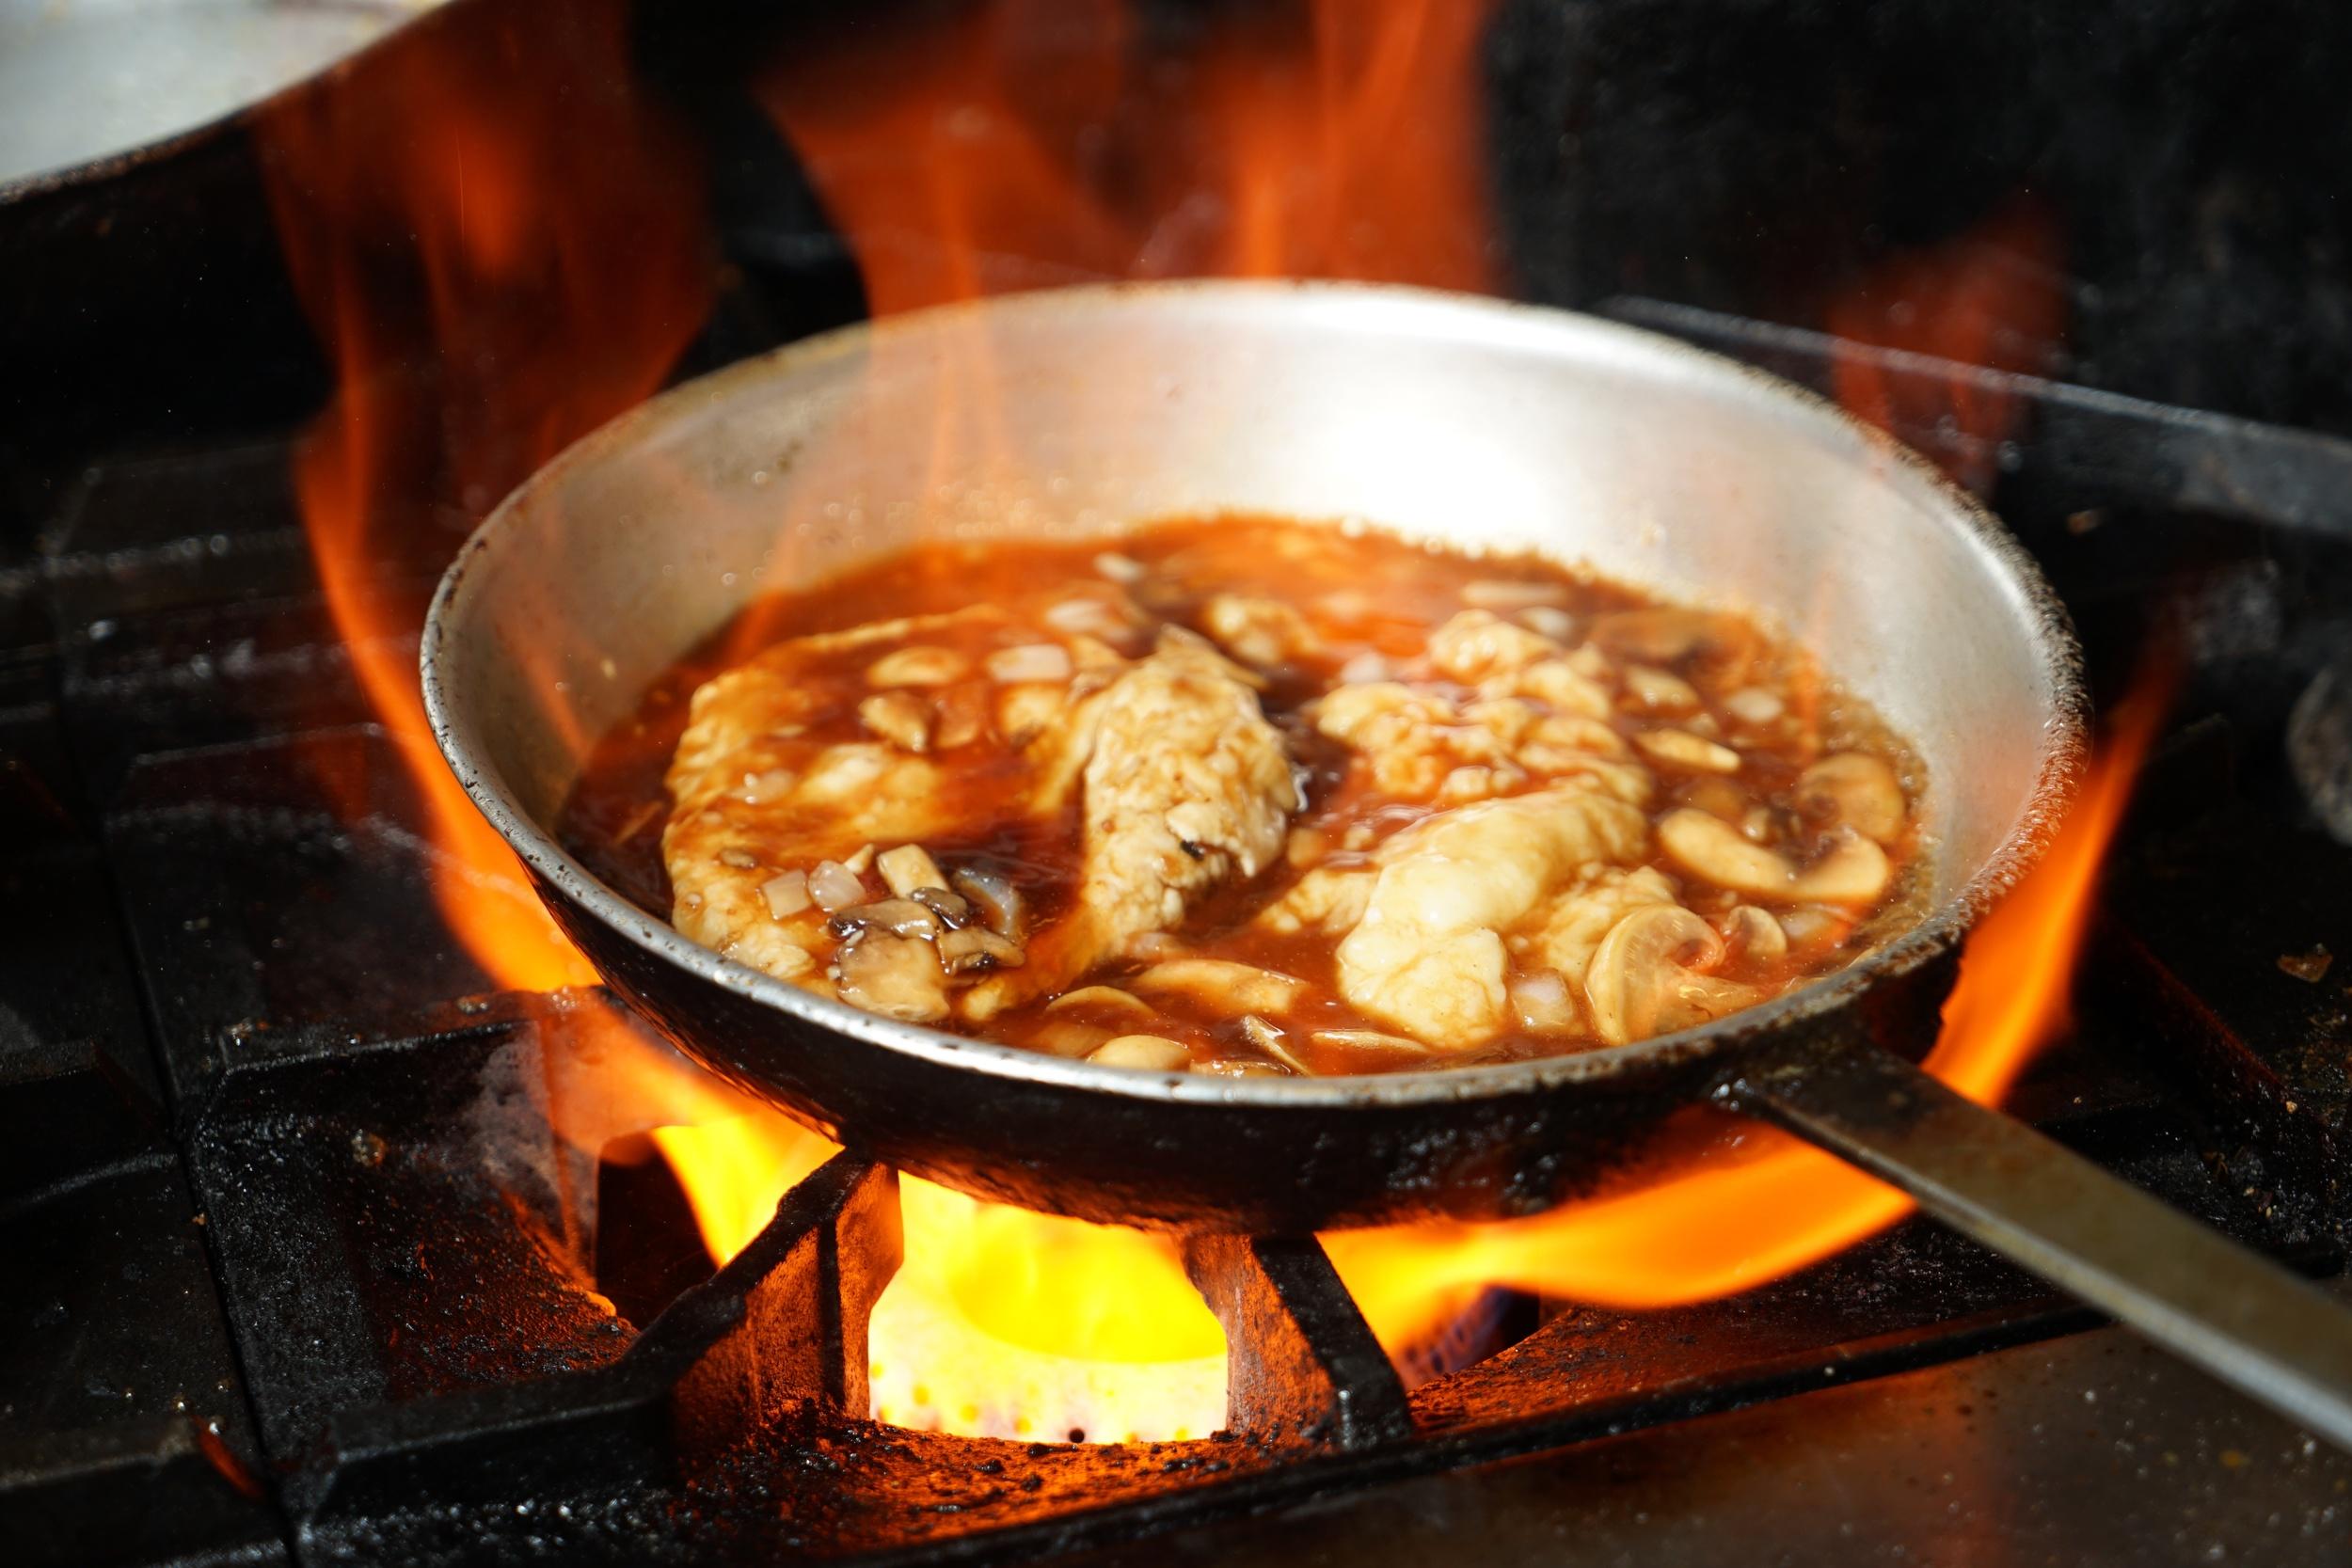 Chef preparing Chicken Marsala